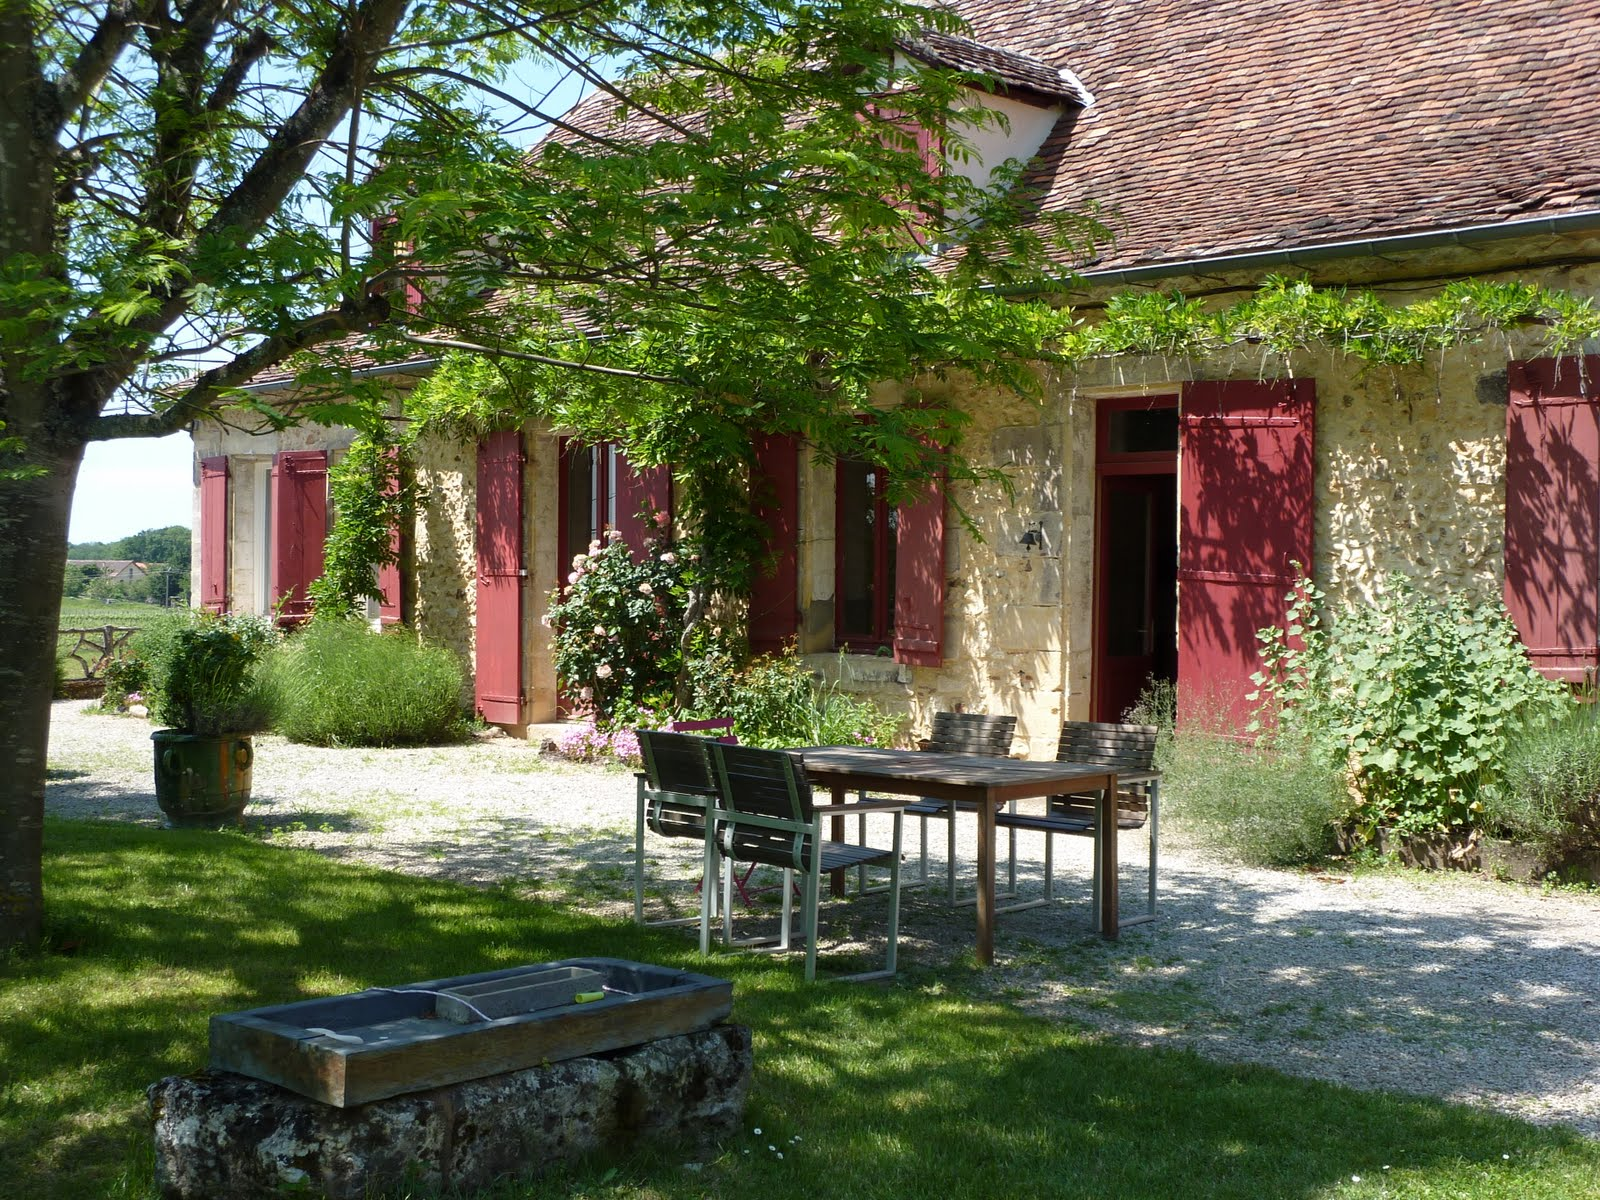 chambre d'hôtes - Bed & Breakfast - Bergerac